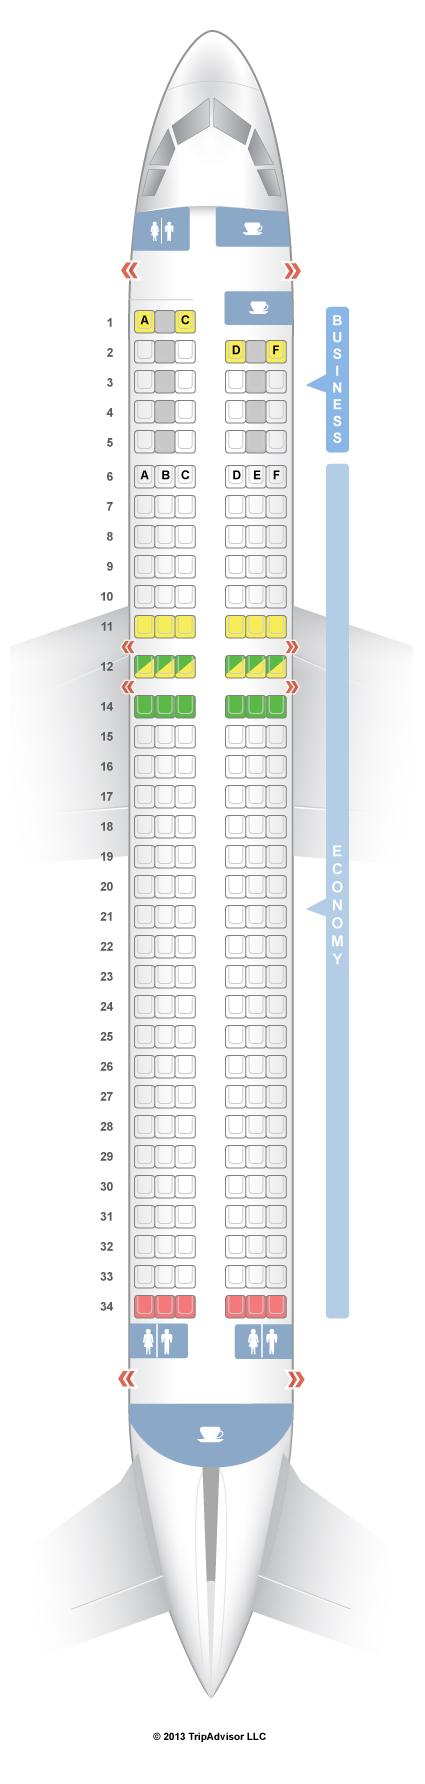 Iberia_Airbus_A320_Express.jpg